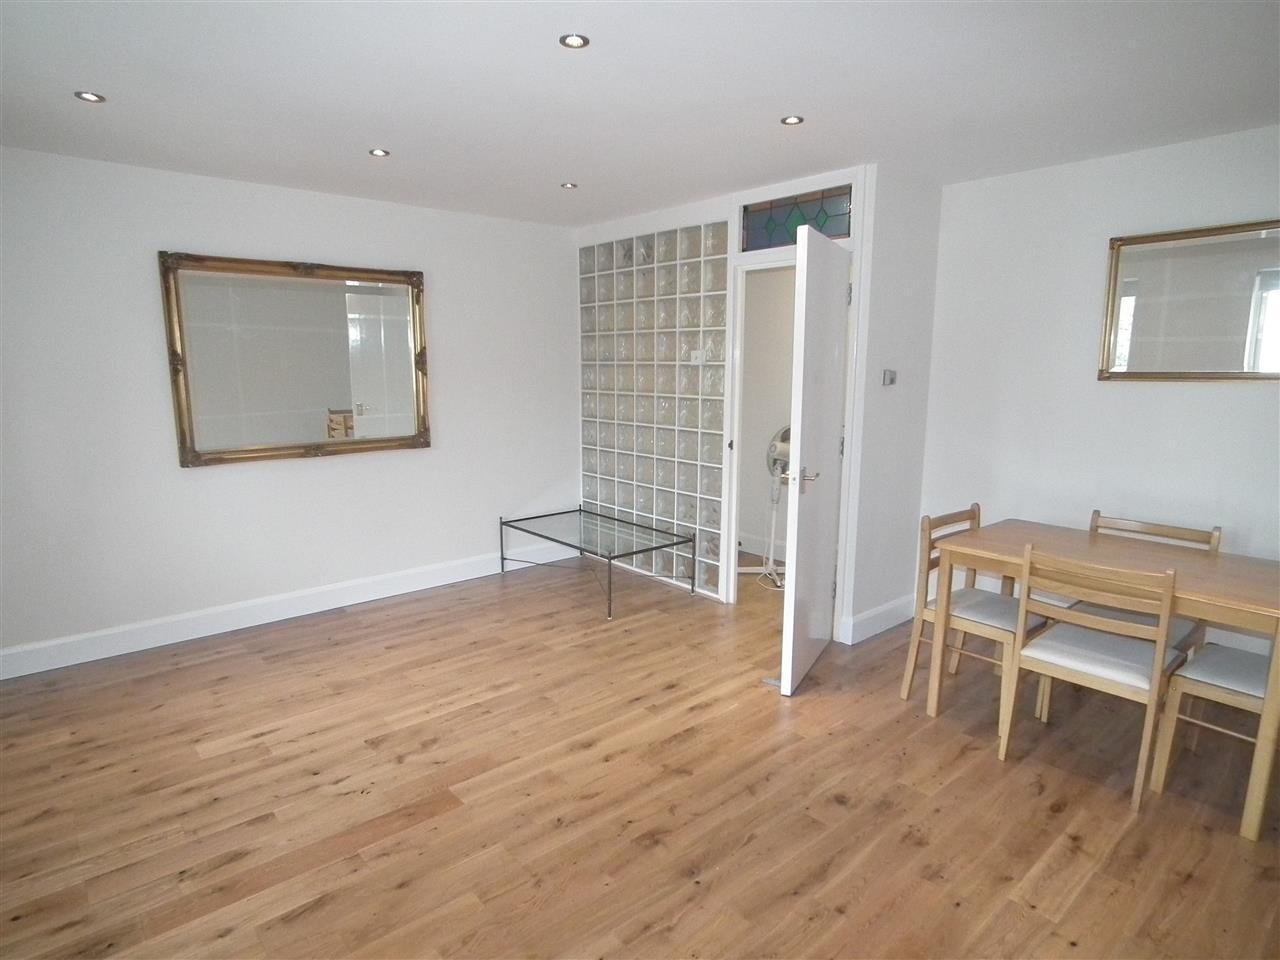 32 bed flat to rent in Bellina Mews, London ref BUR32BUR32003232032 ...